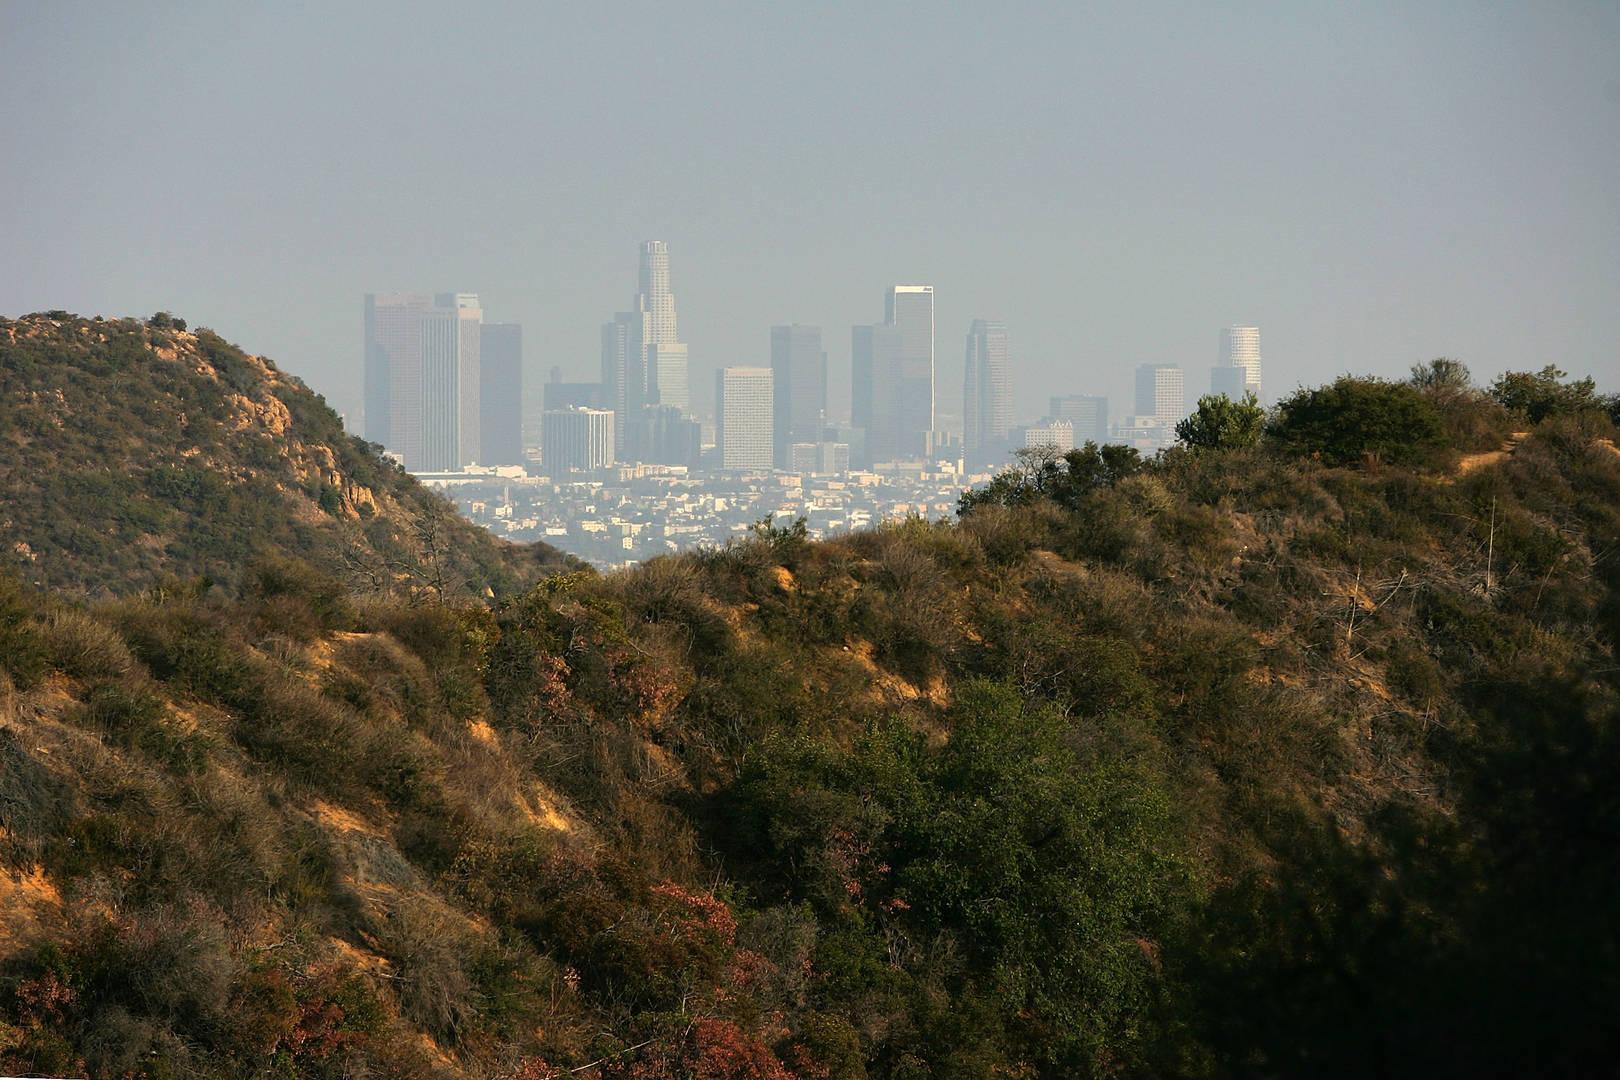 Los Angeles, FEMA